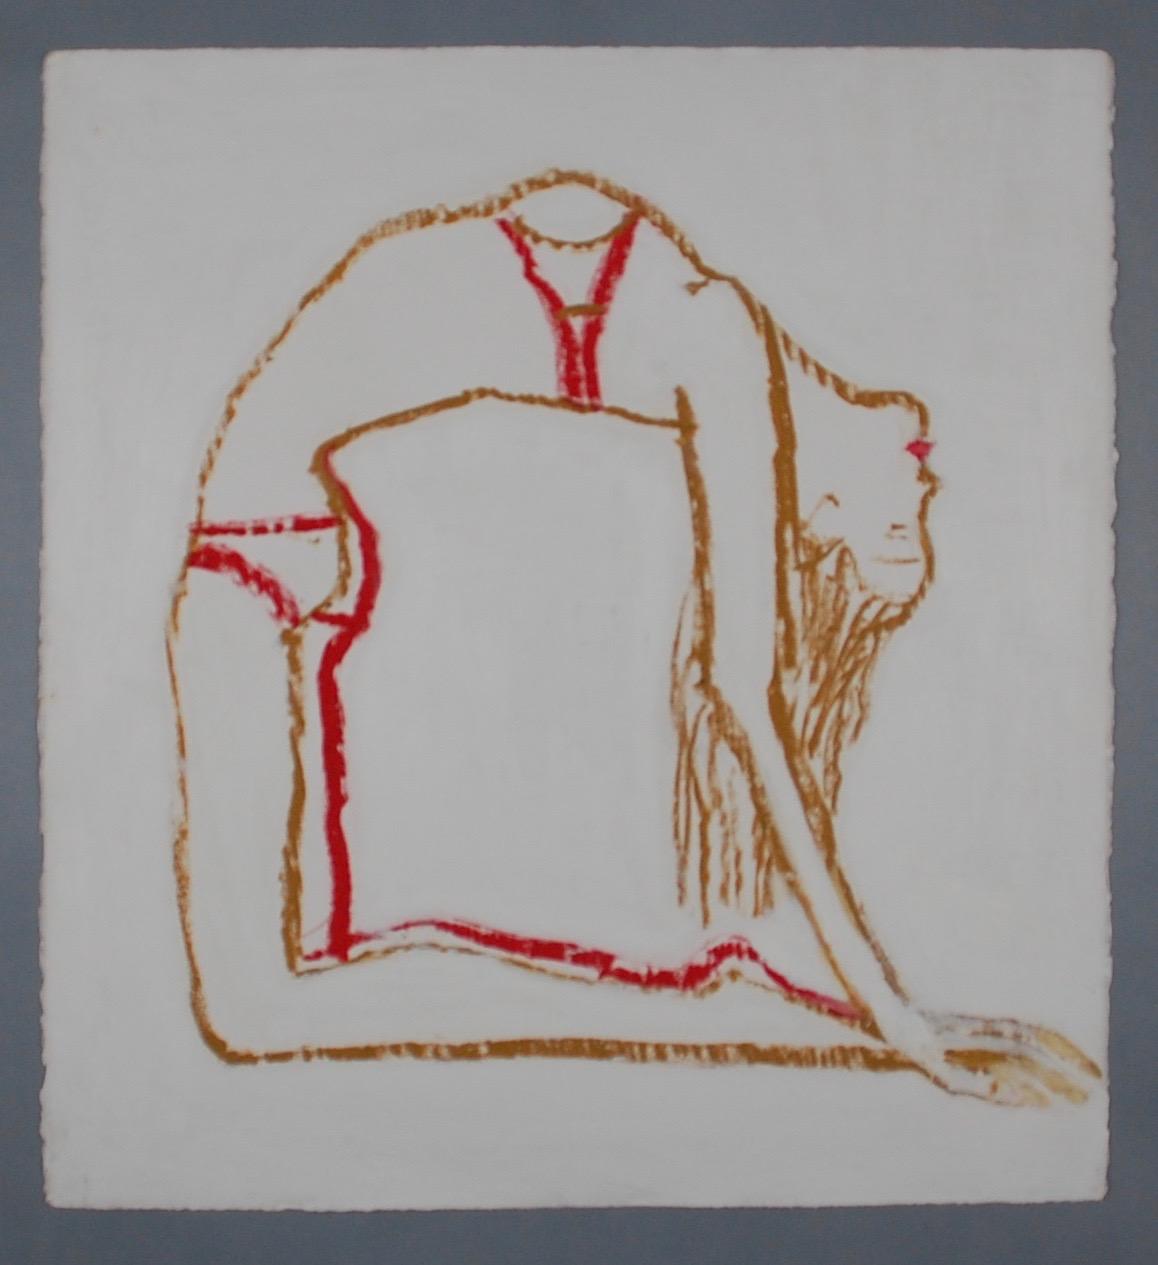 Female figure, Yoga, arc